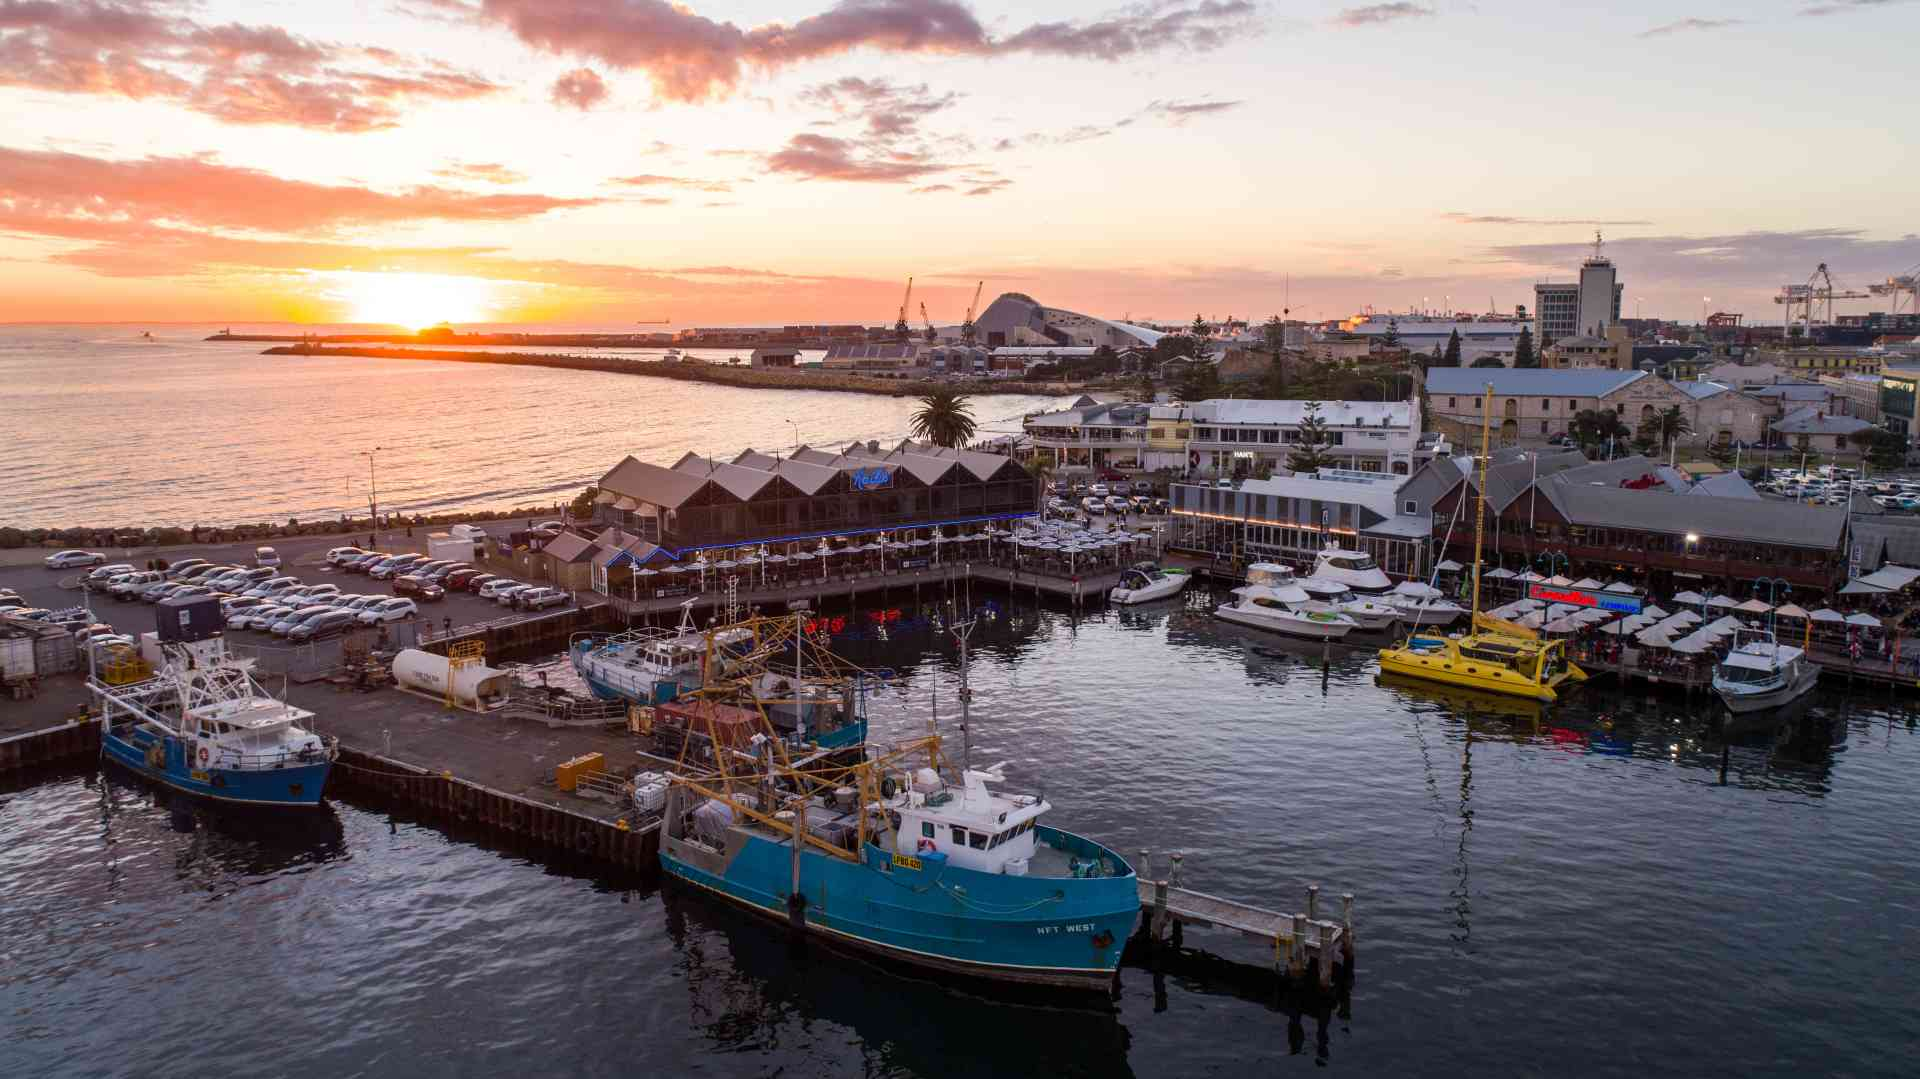 Fremantle Fishing Boat Harbour, Western Australia